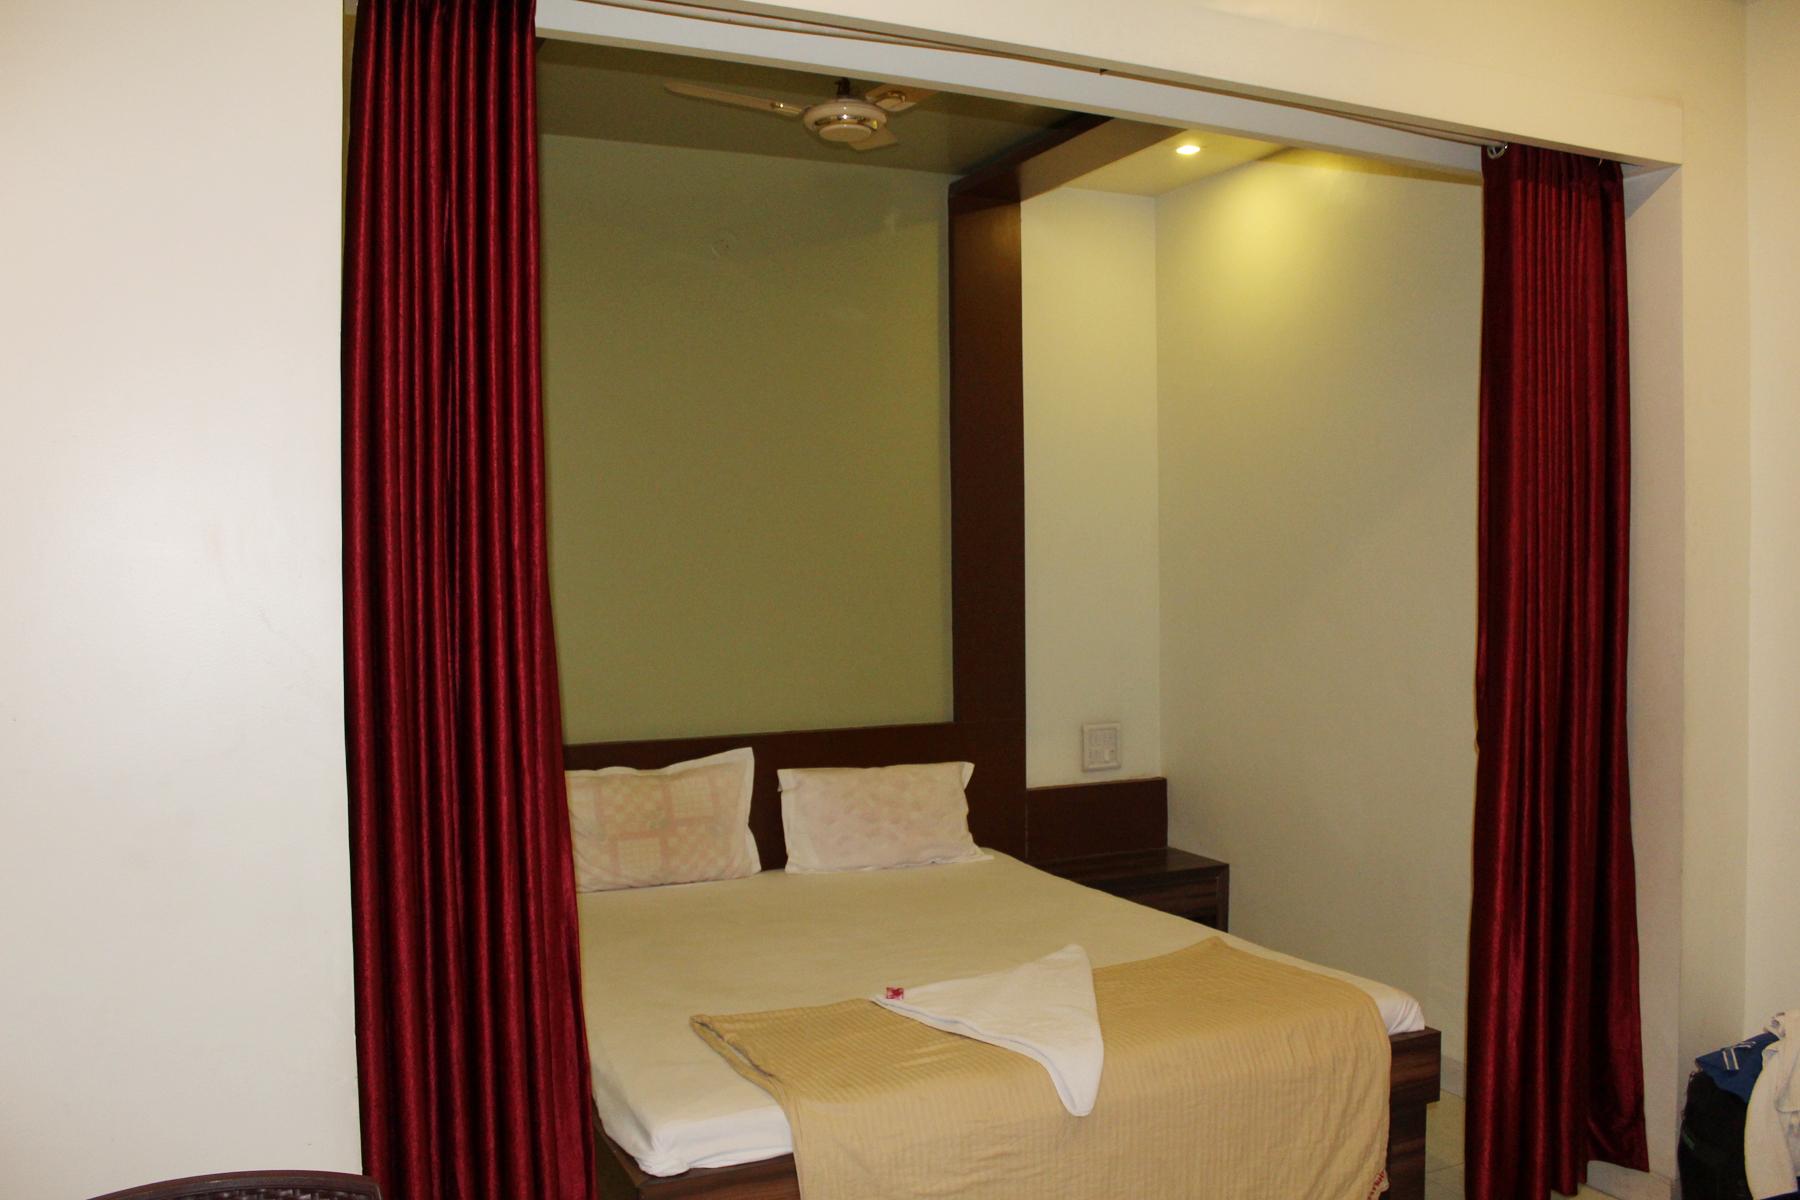 Hotel Udayshree Palace in Latur